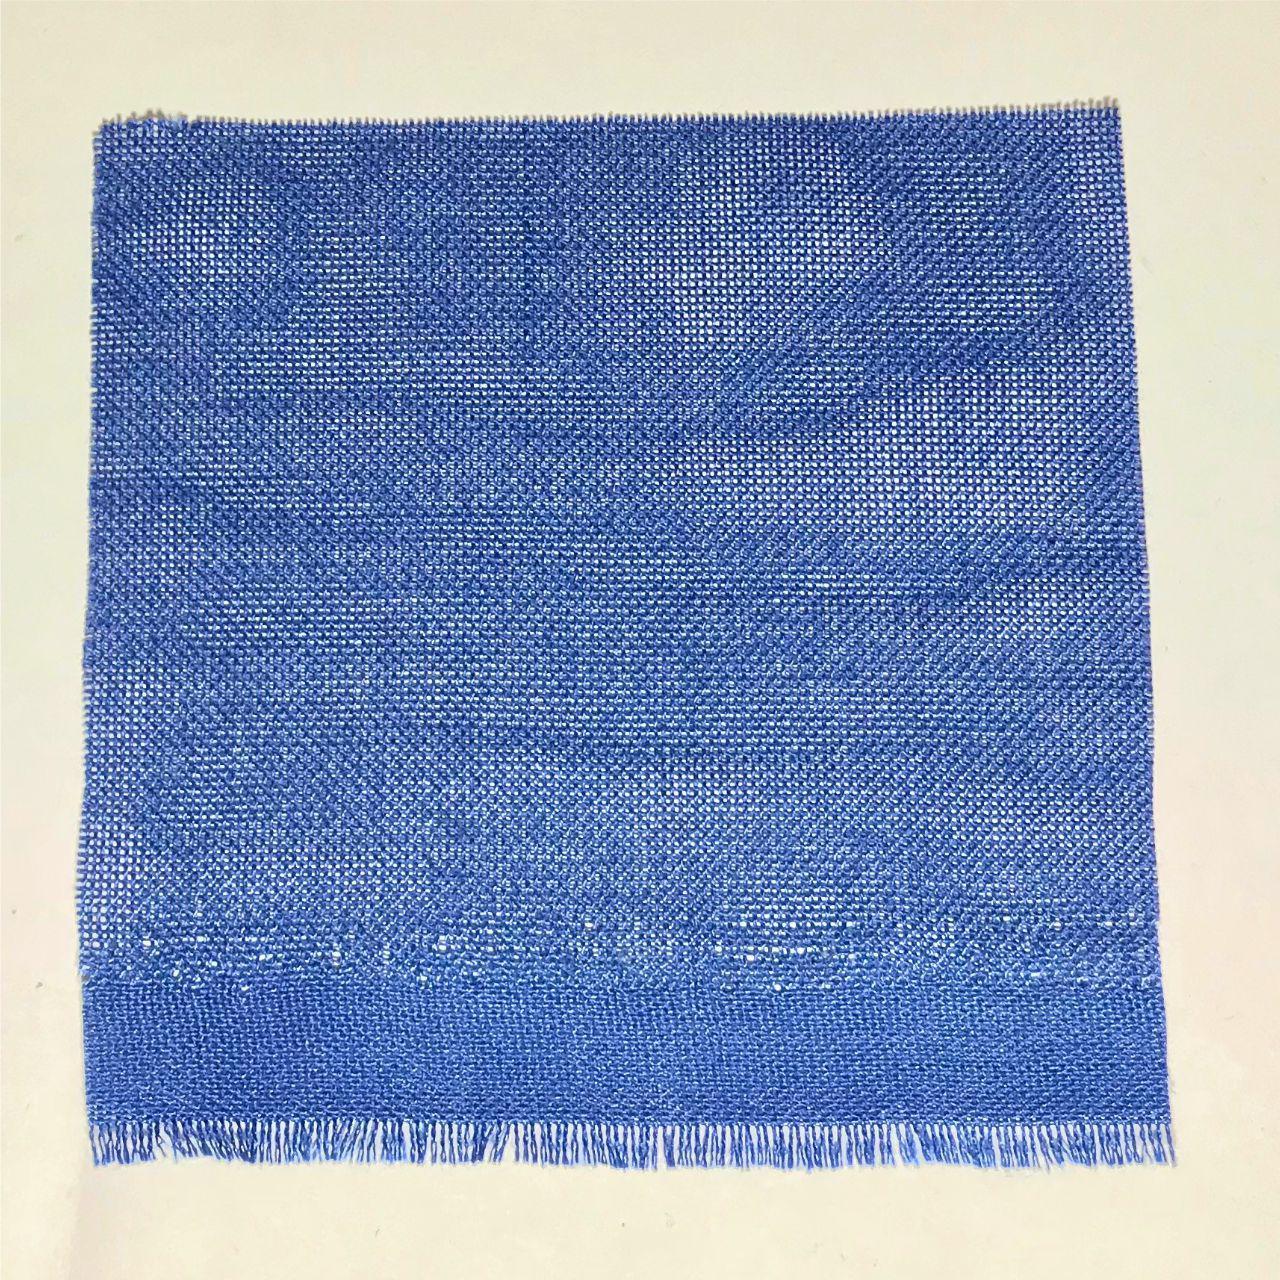 Флажная ткань (электрик, 100% полиэстер) - 155 г/м2